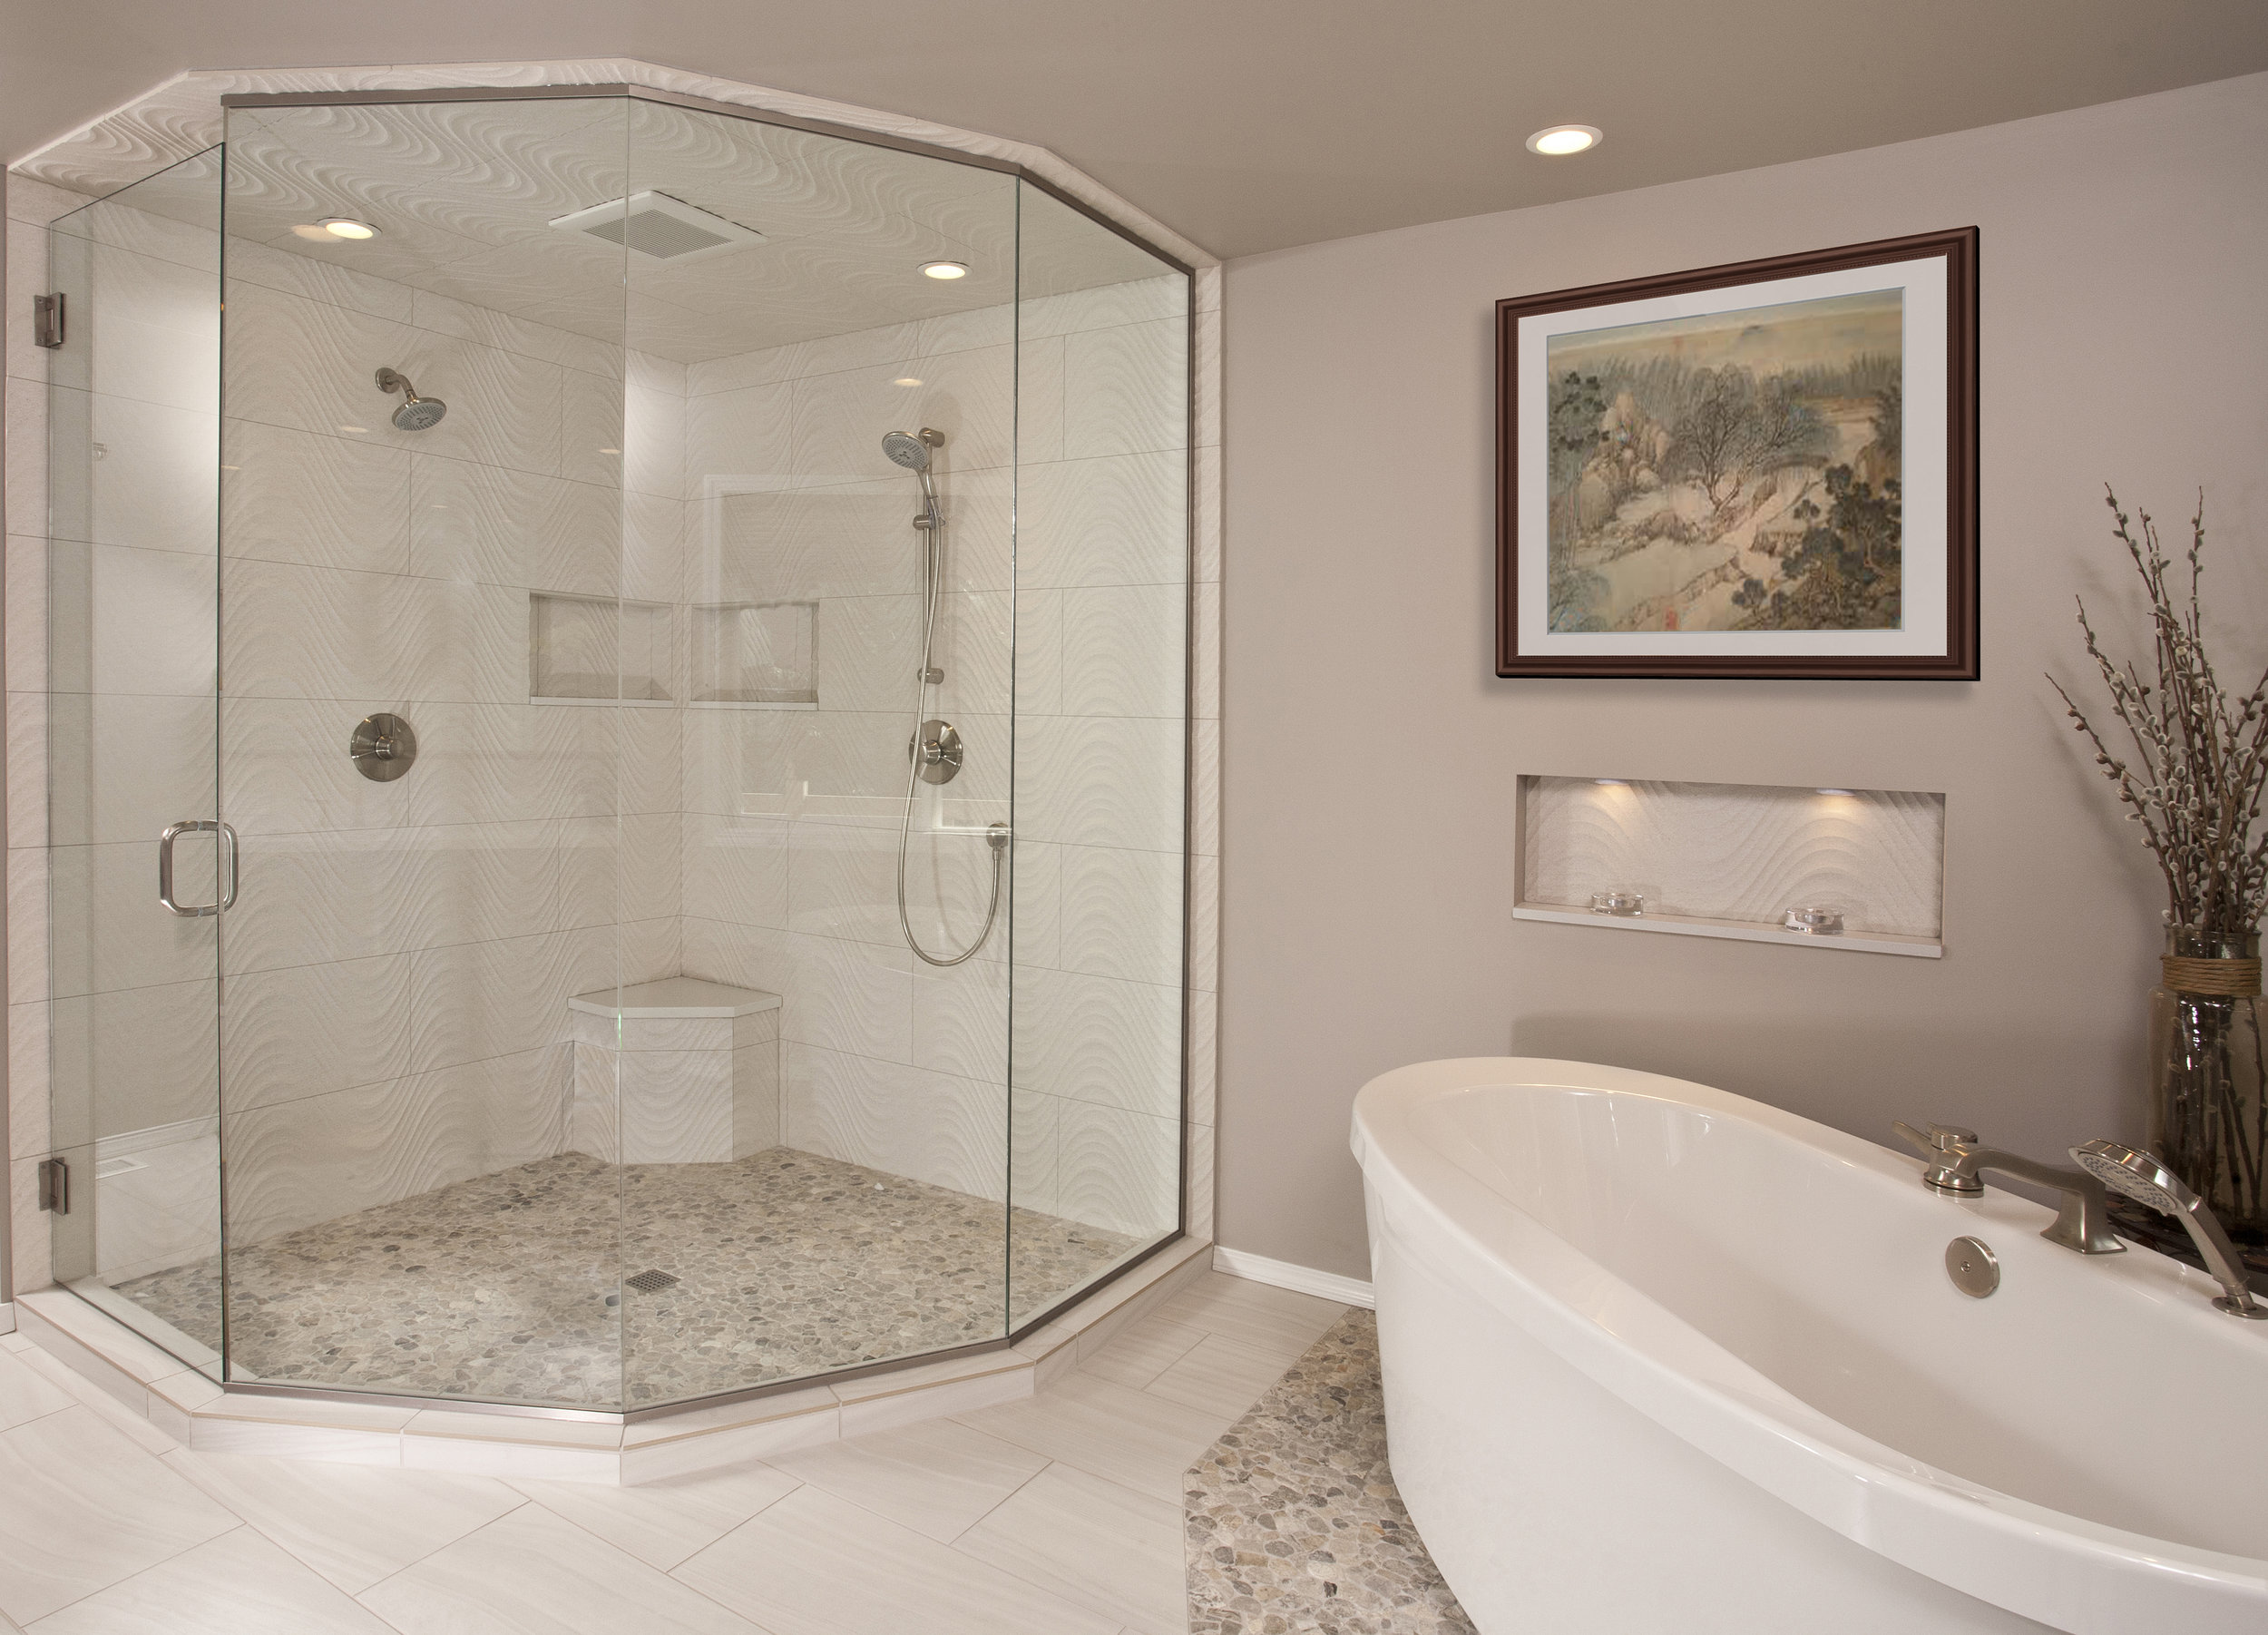 Bellevue Clyde Hill Contemporary Master Bath 6.jpg